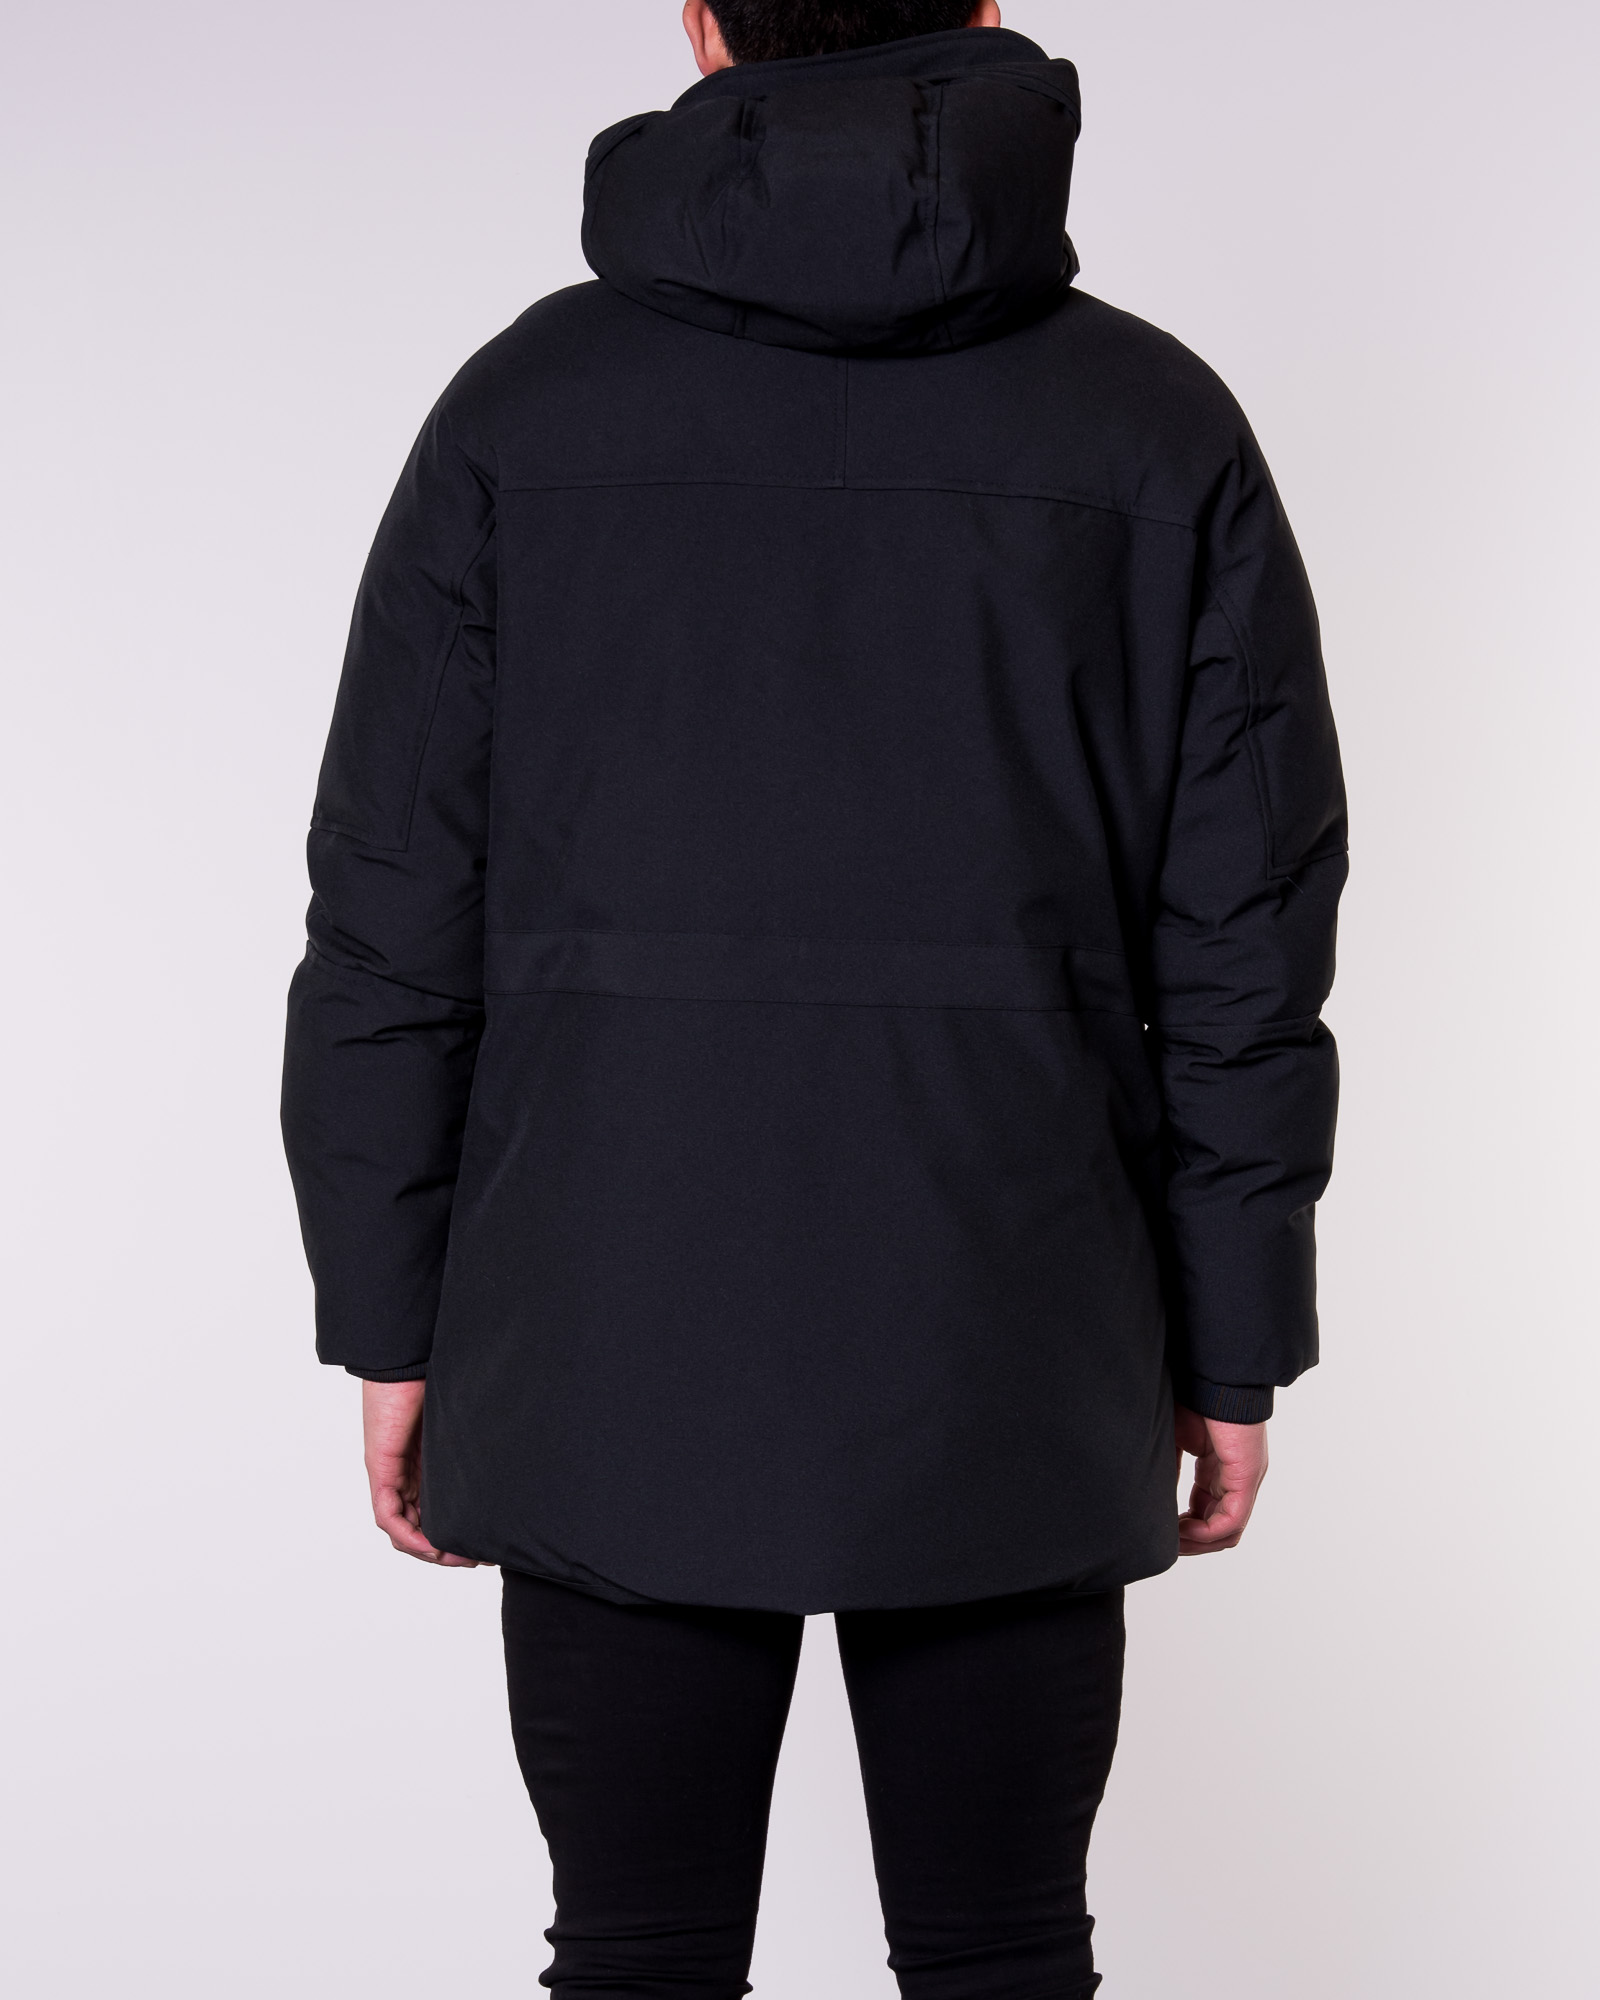 Heather Canyon™ Softshell Jacket, naisten softshelltakki